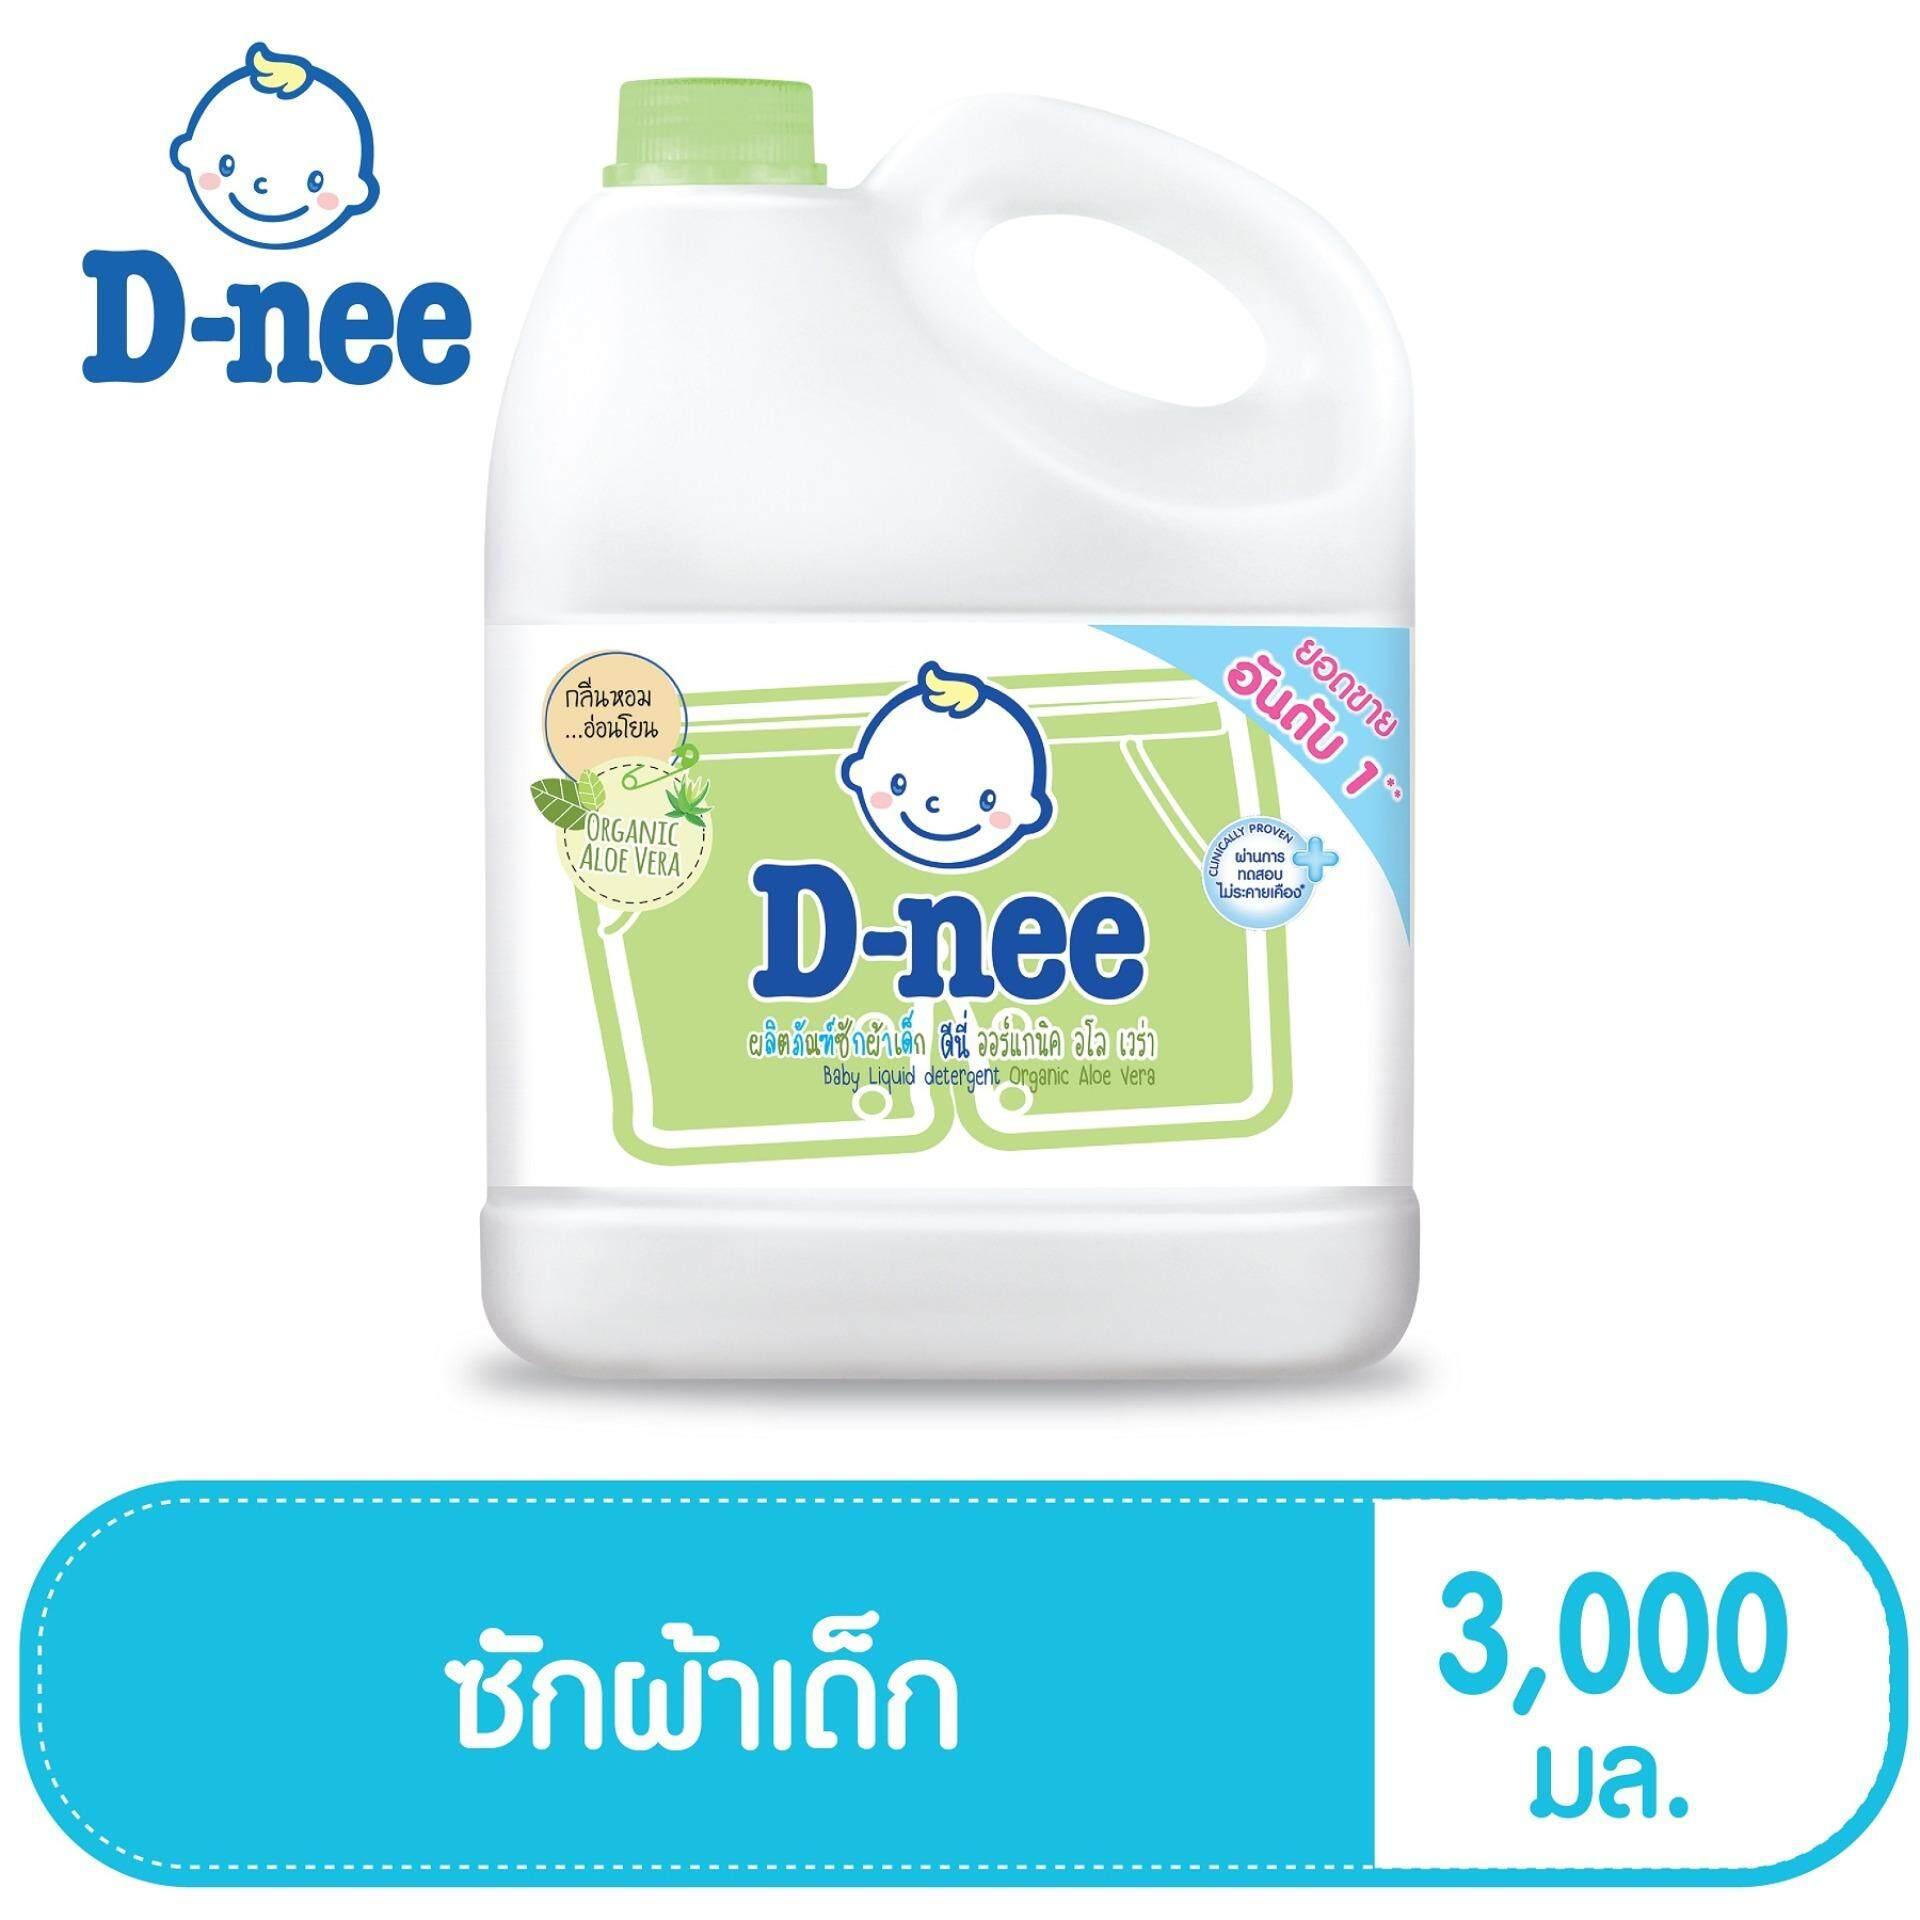 D-Nee Baby Liquid Detergent Organic Aloe Vera 3000 Ml ผลิตภัณฑ์ซักผ้าเด็ก ดีนี่ออร์แกนิค อโล เวร่า 3000 มล. By Lazada Retail D-Nee.